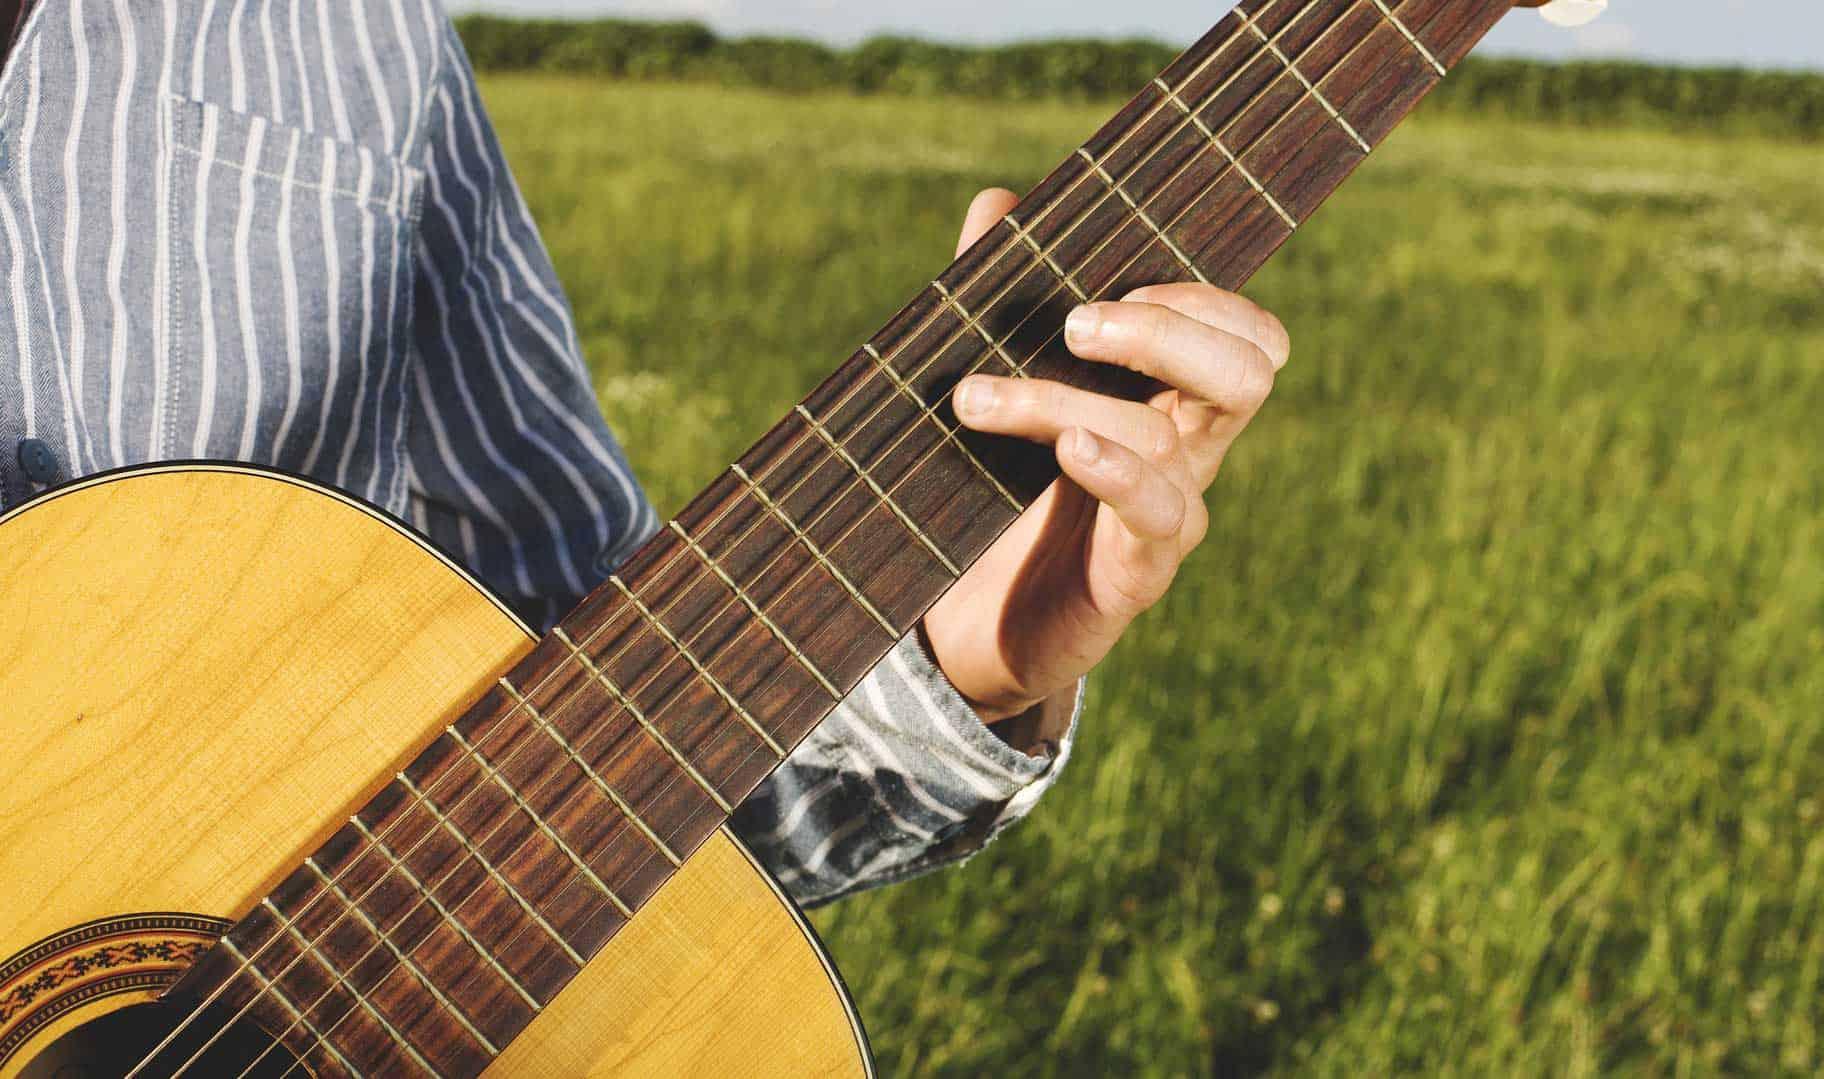 8 Effektive Aufwärmübungen für Gitarre   gitarrenbeginner.de